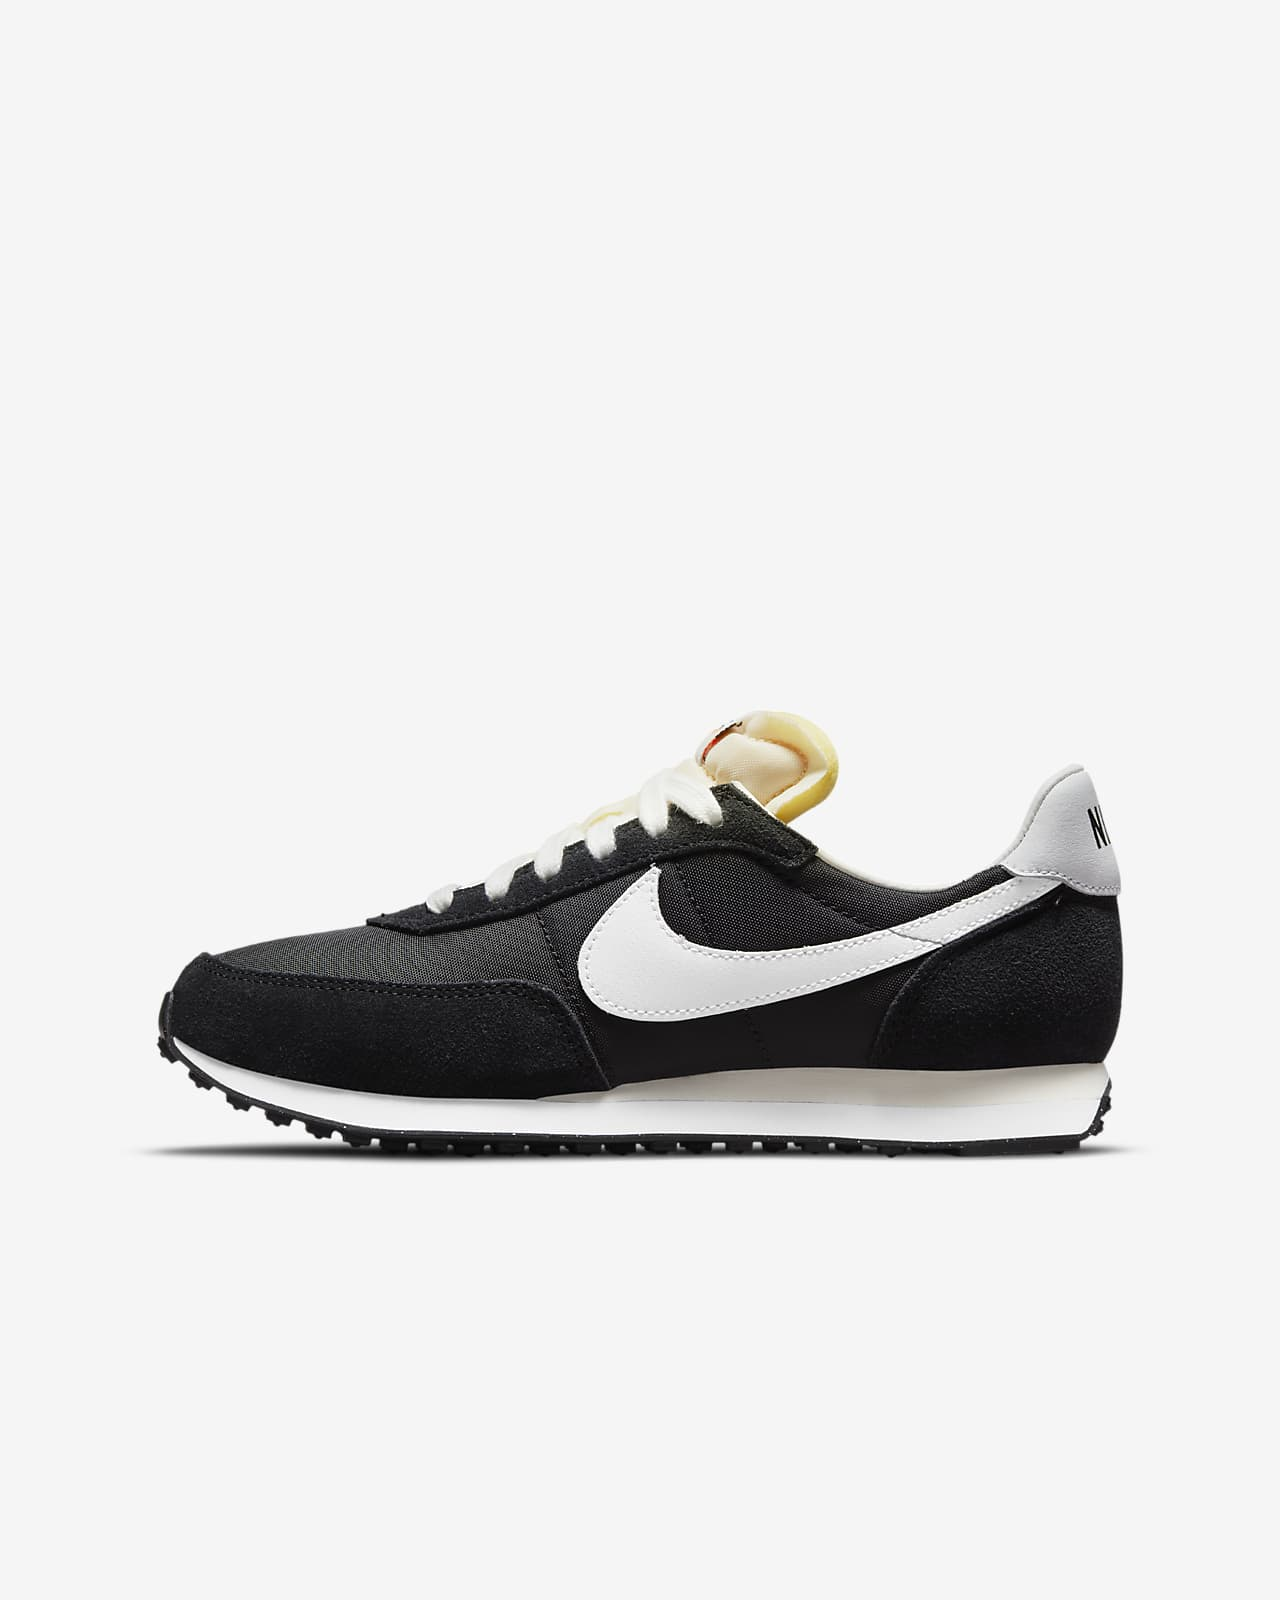 Nike Waffle Trainer 2 Zapatillas - Niño/a